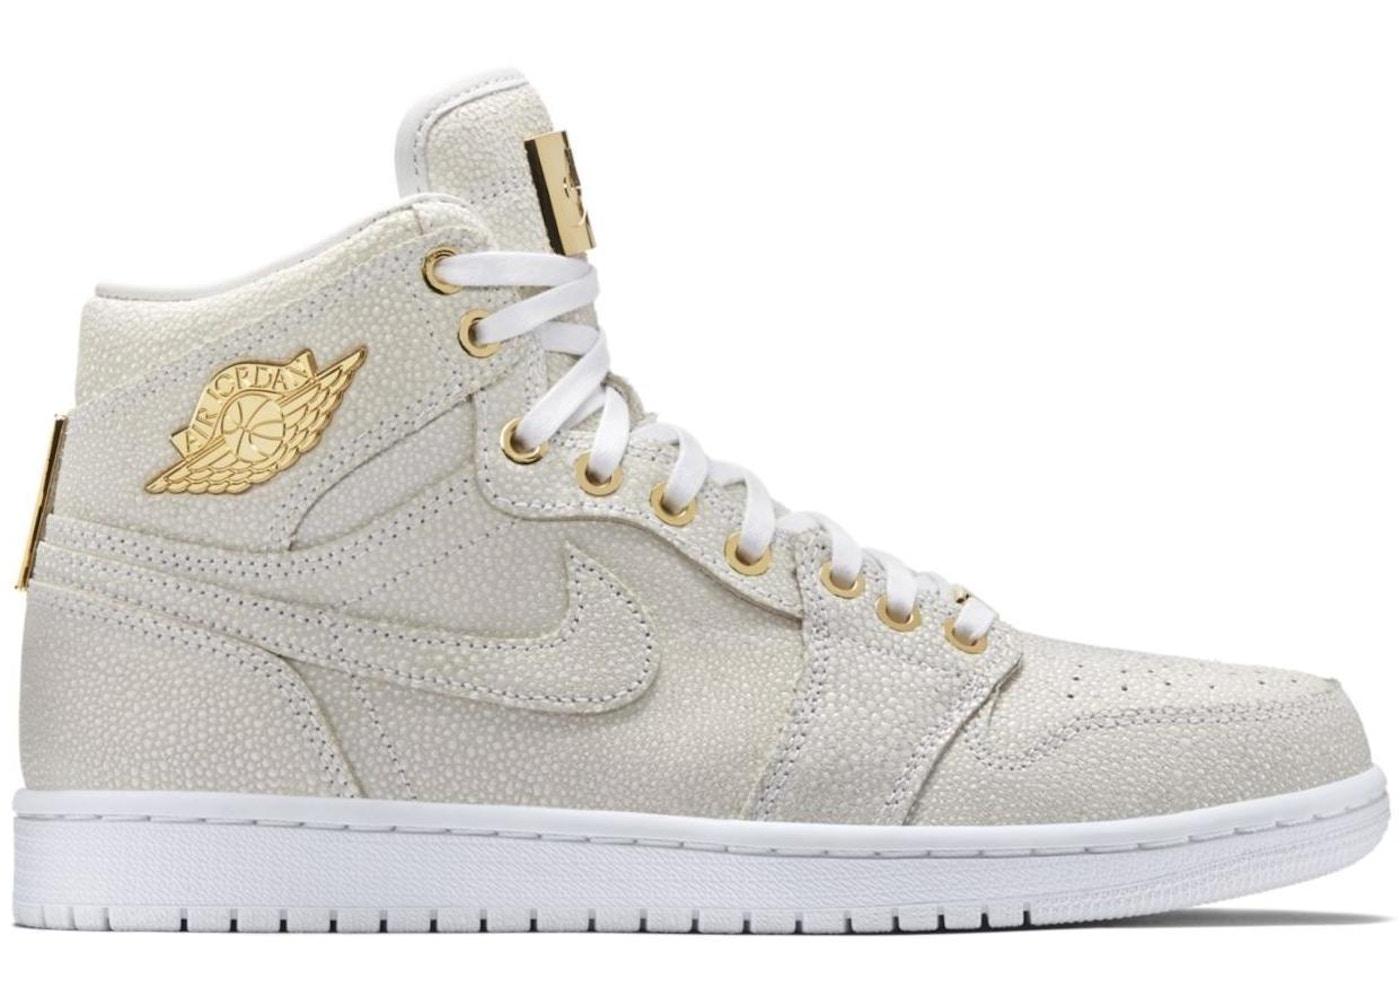 best sneakers 80a45 0b56c Jordan 1 Retro Pinnacle White - 705075-130